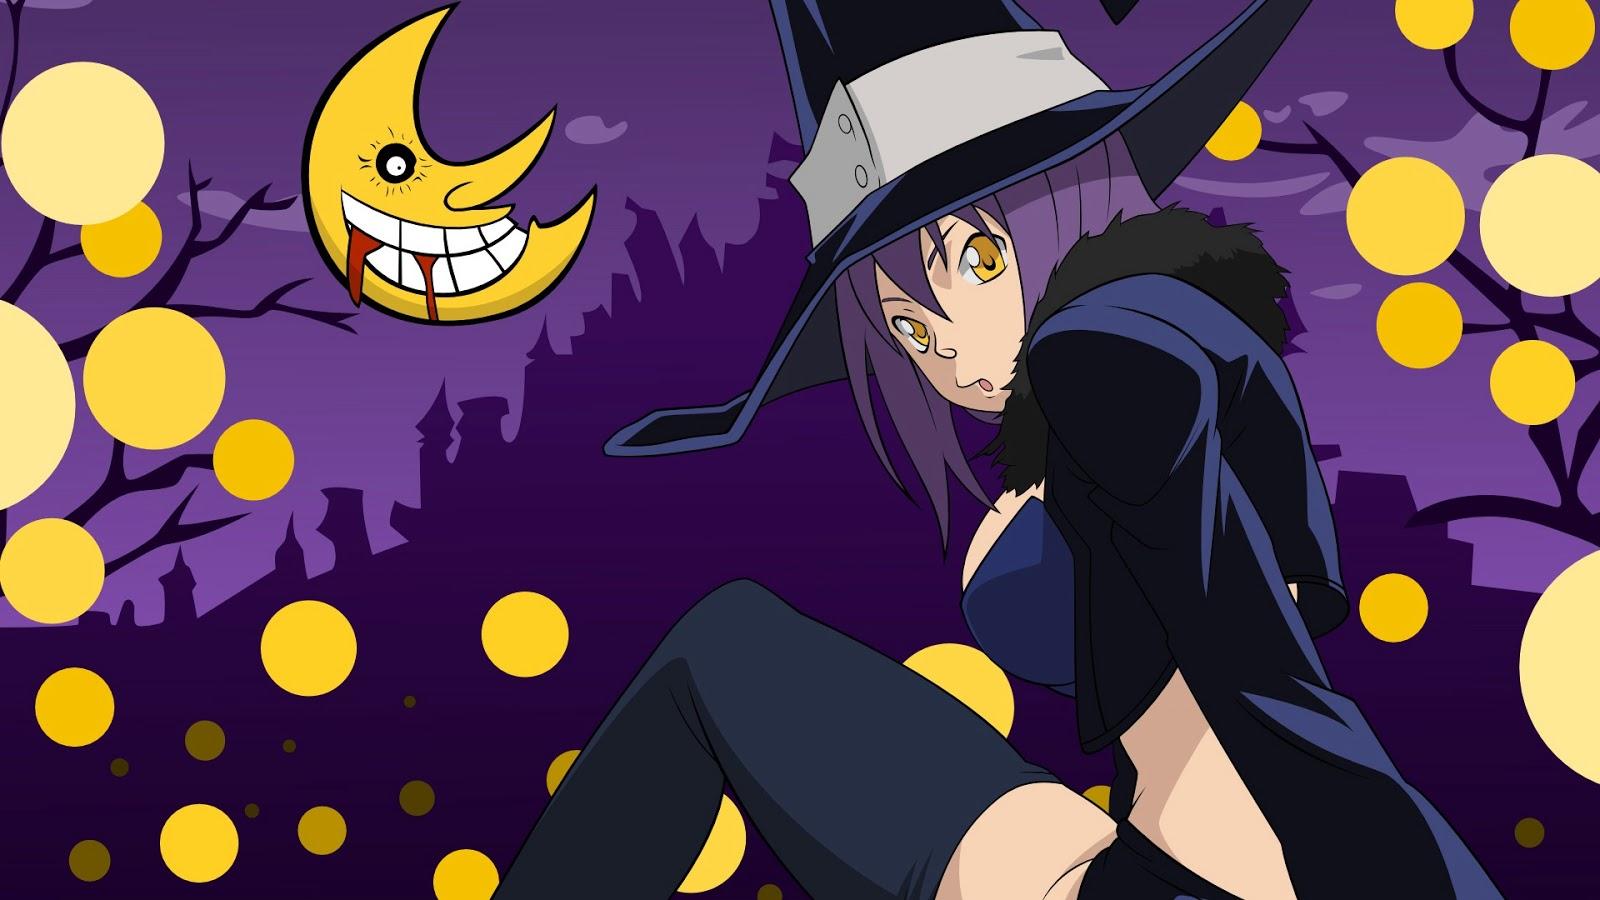 Good Wallpaper Halloween Purple - halloween-anime-336603  2018_756736.jpg